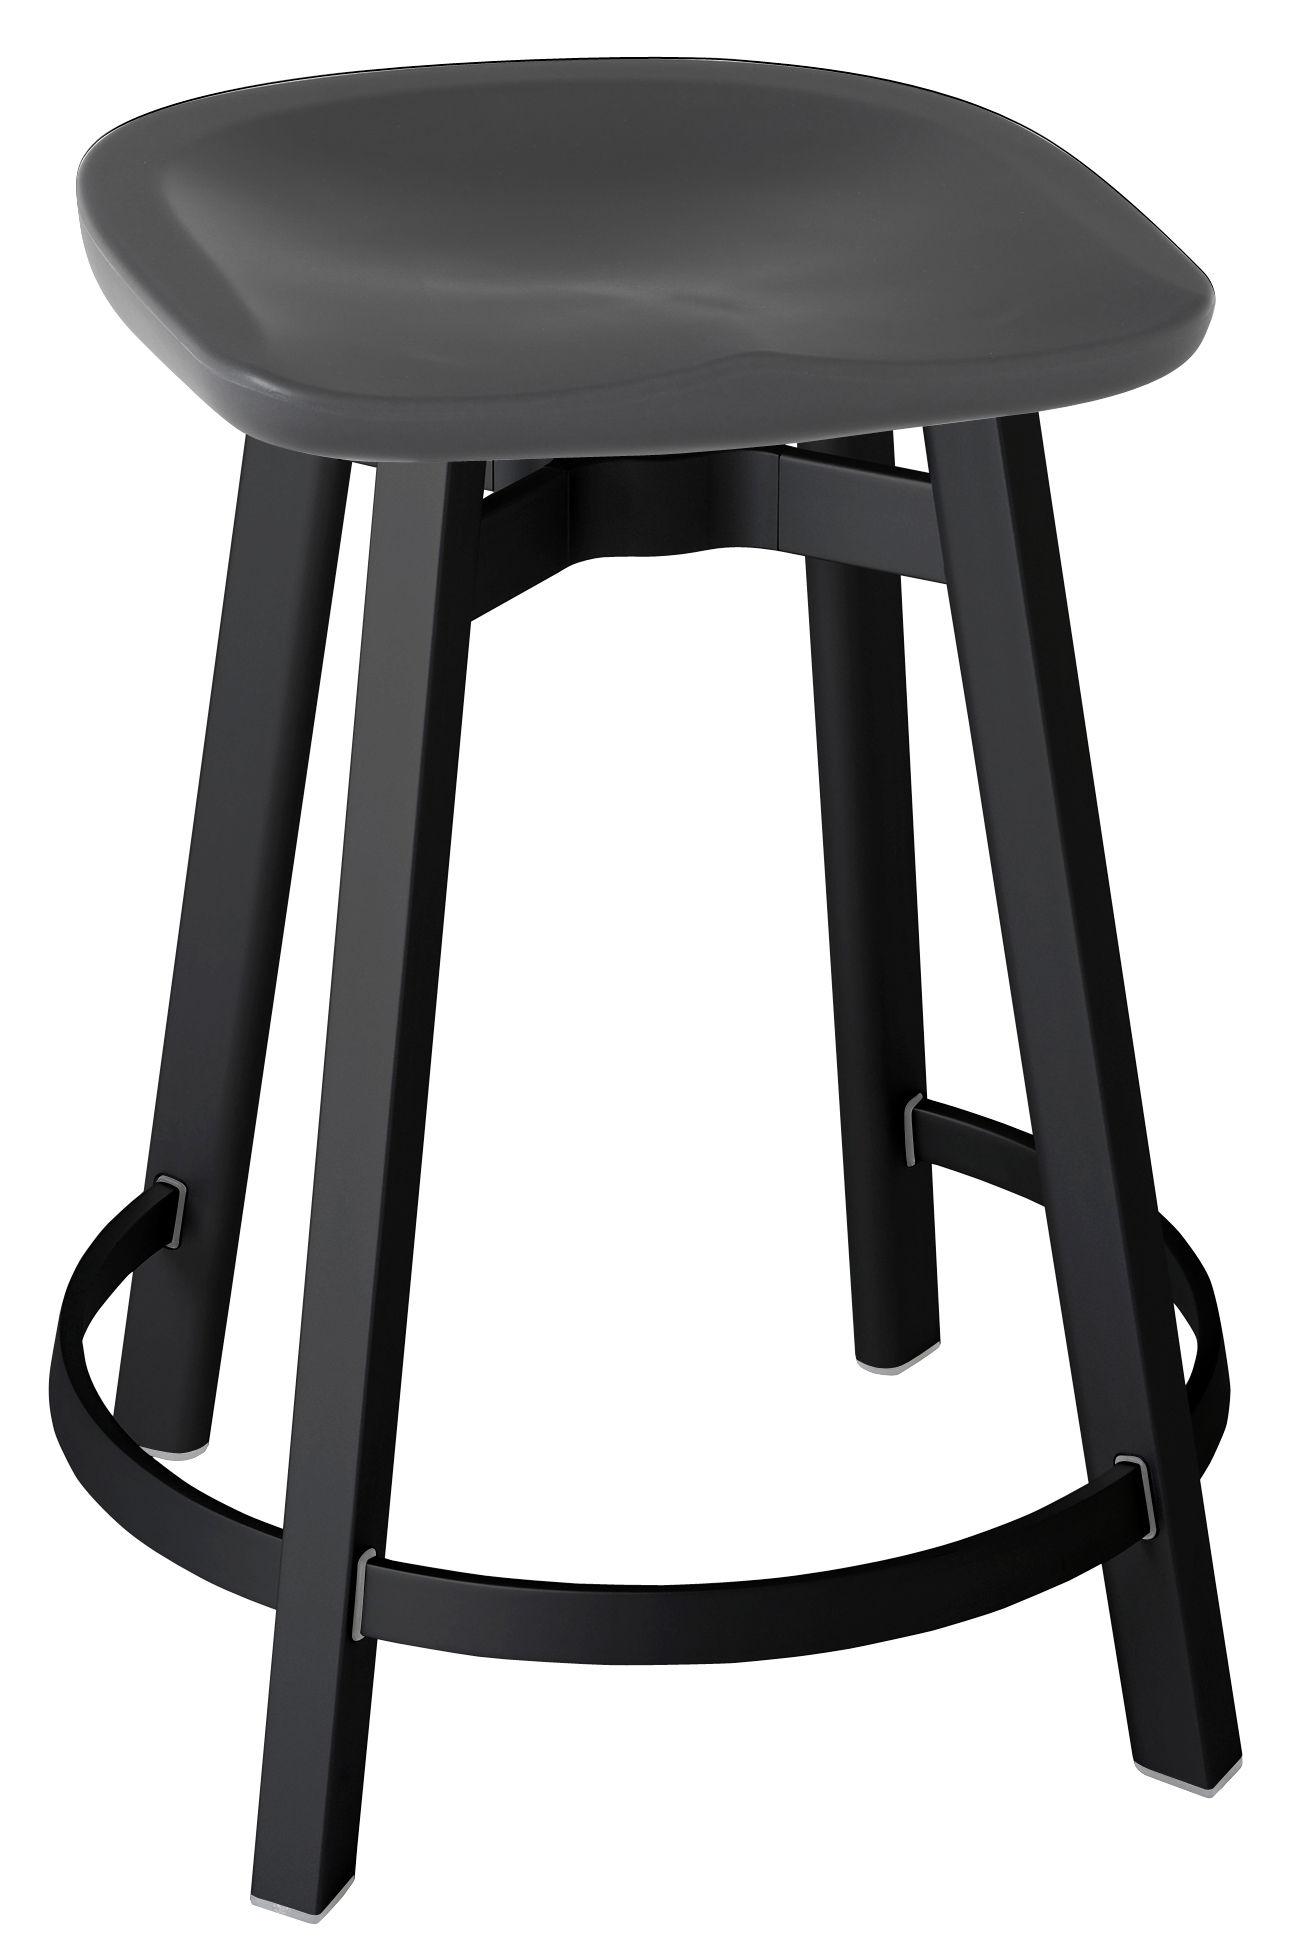 Furniture - Bar Stools - Su Bar stool - H 61 cm - Polyethylen seat by Emeco - Seat : Charcoal - Legs : Black Aluminium - Aluminium recyclé, Recycled polypropylene